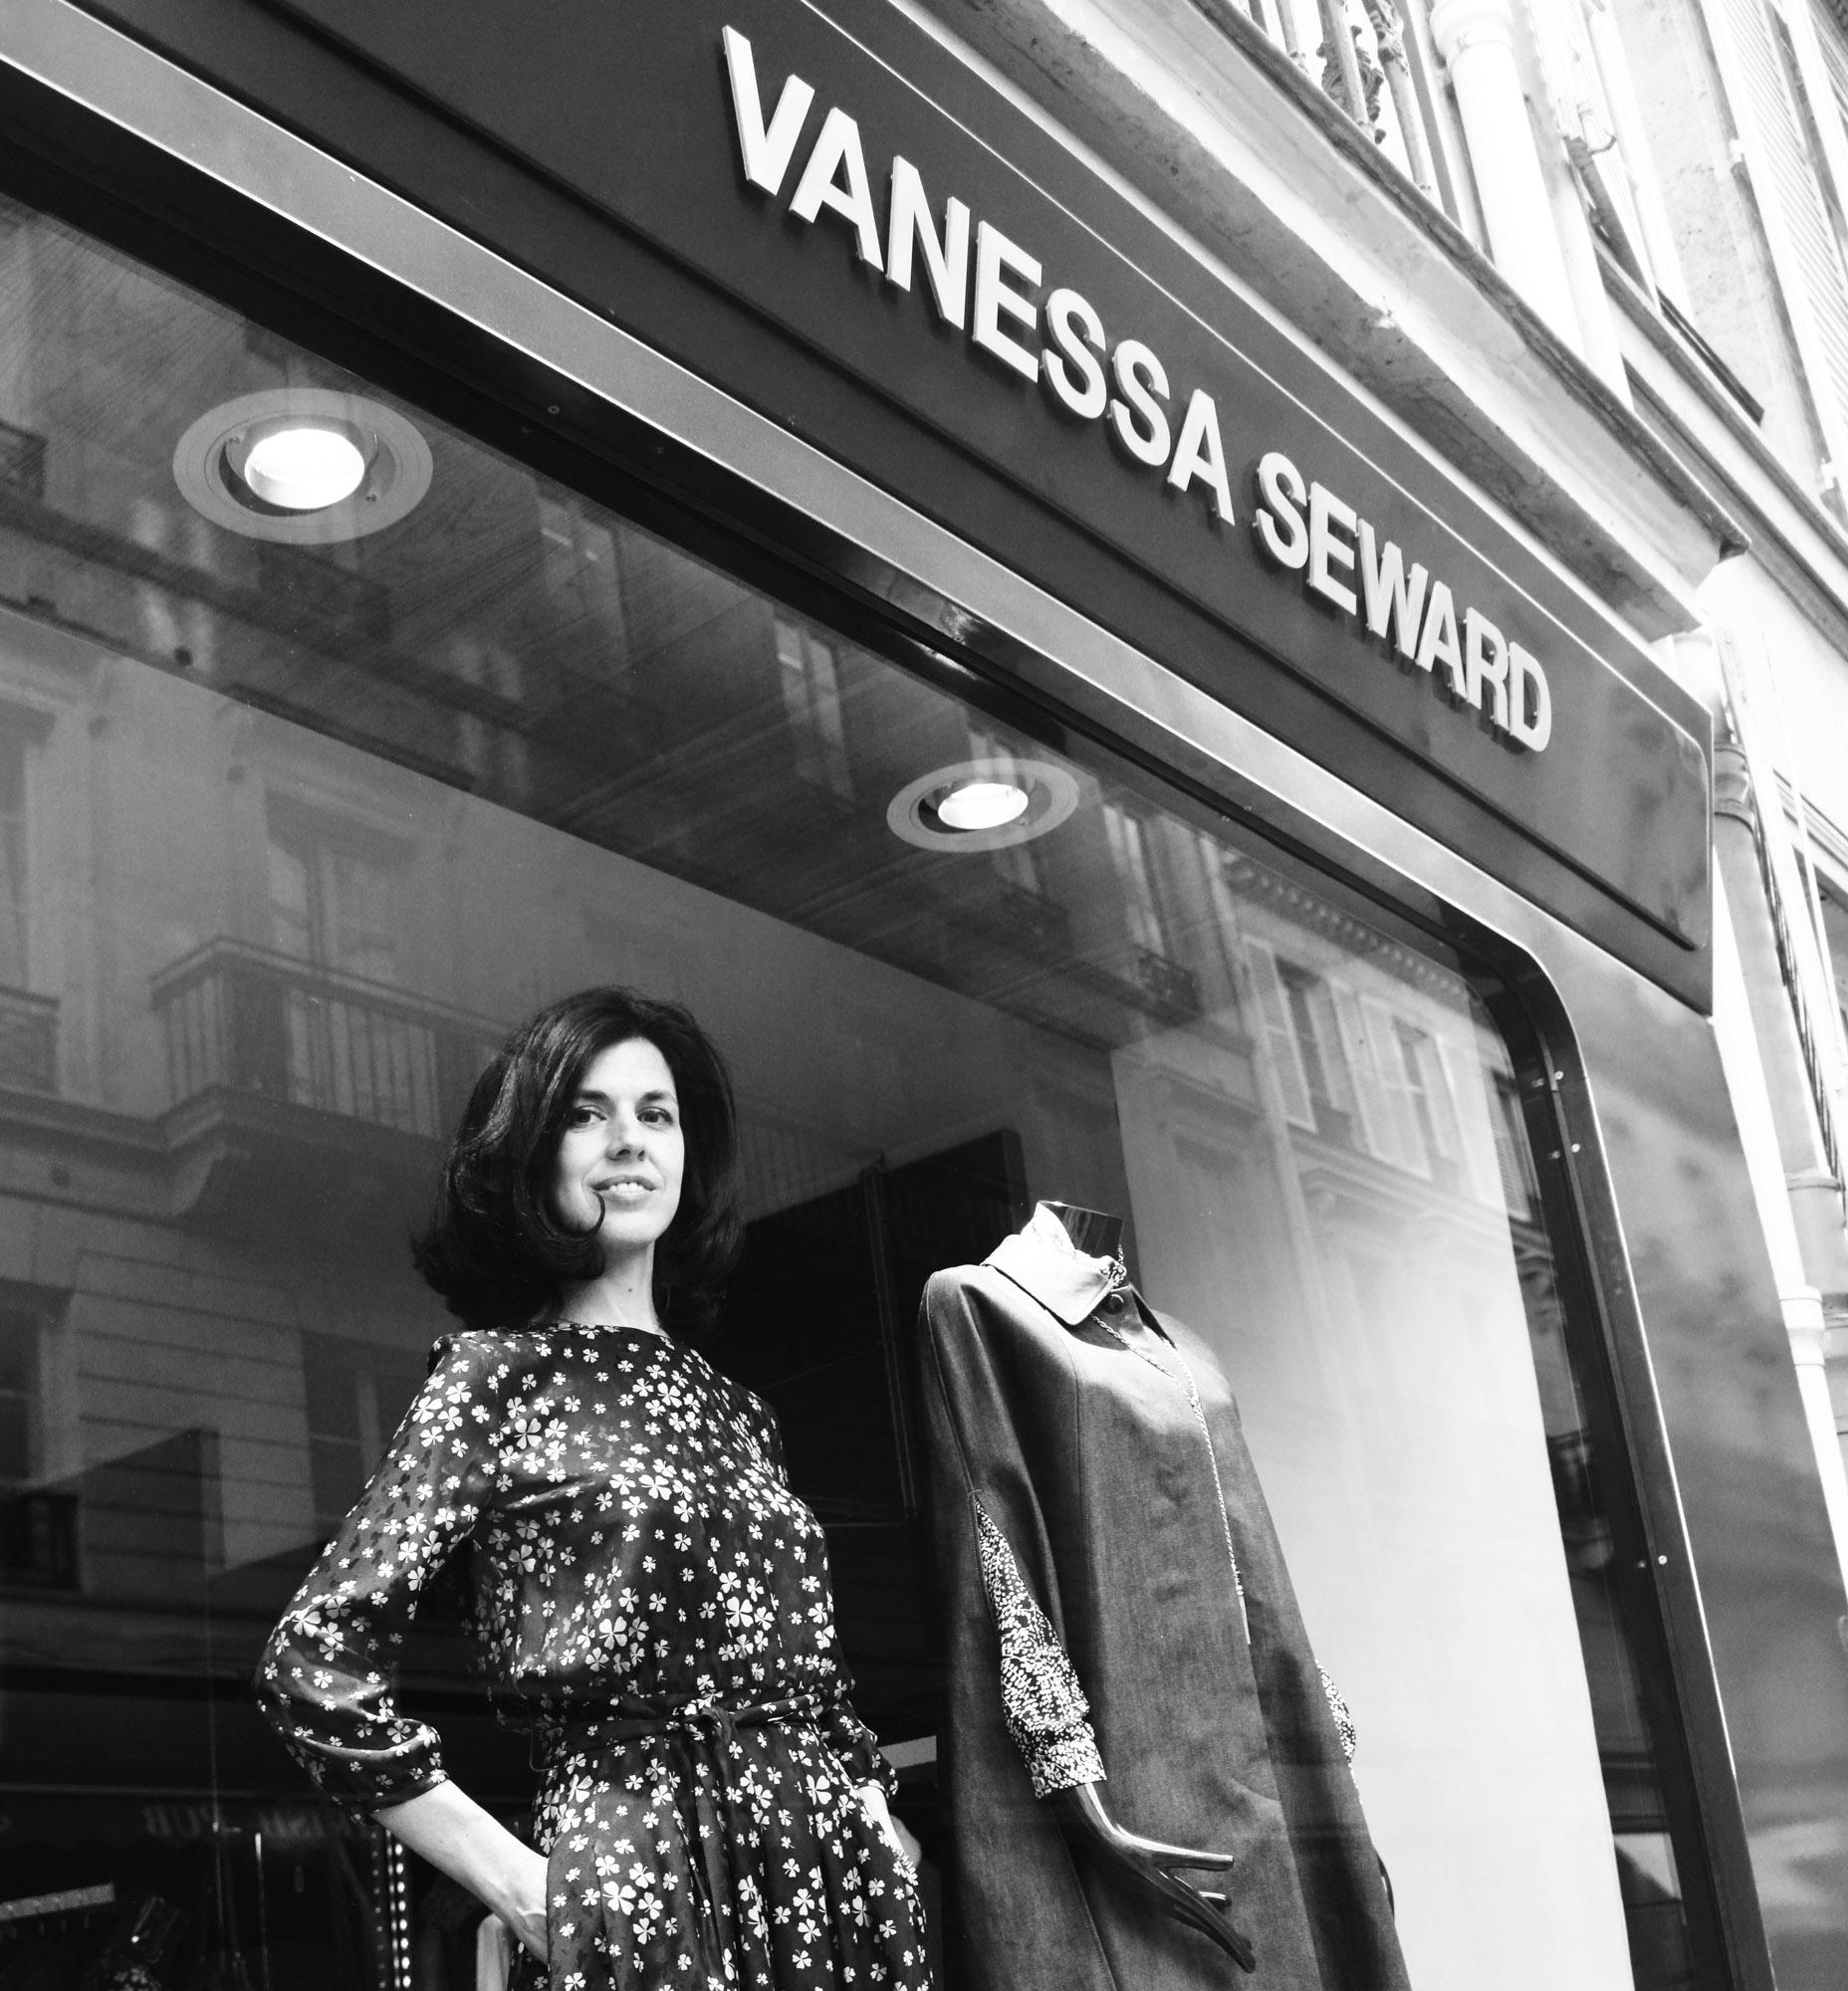 Vanessa Seward ©Olivier Placet